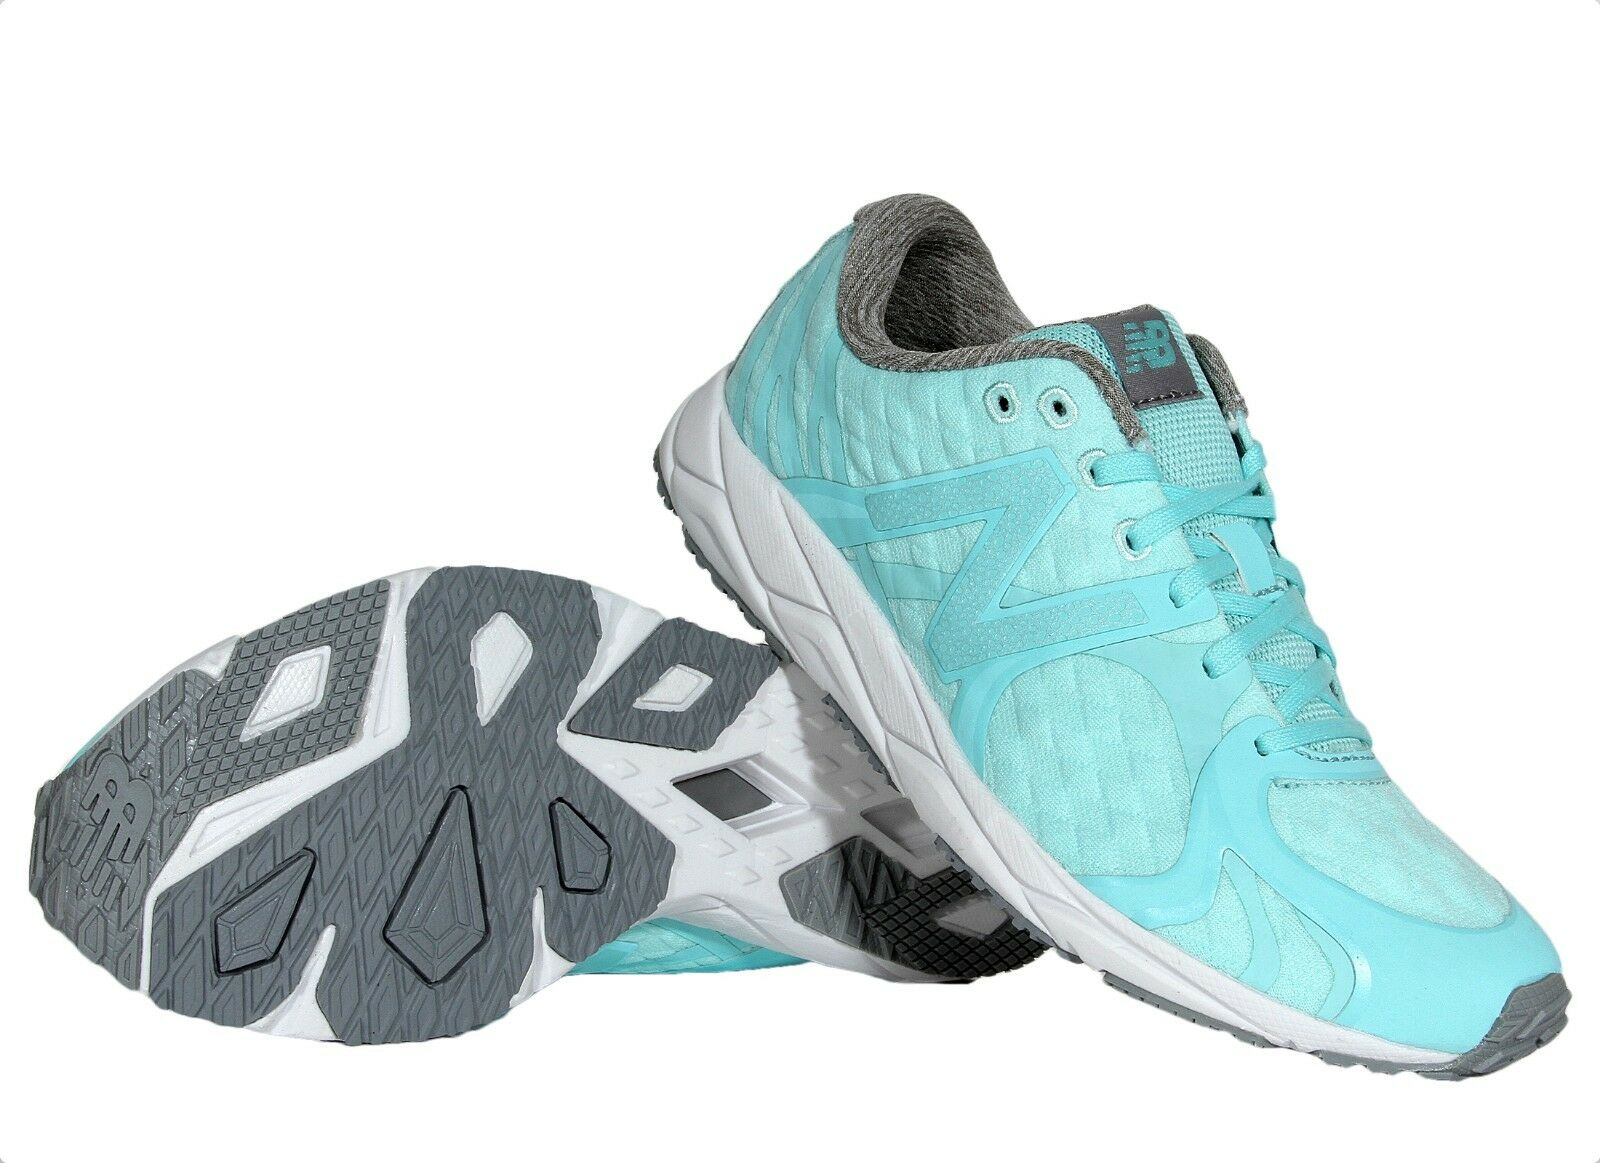 New Balance 1400 Sirens Premium Performance Women's Running Shoes WL1400SB Blue